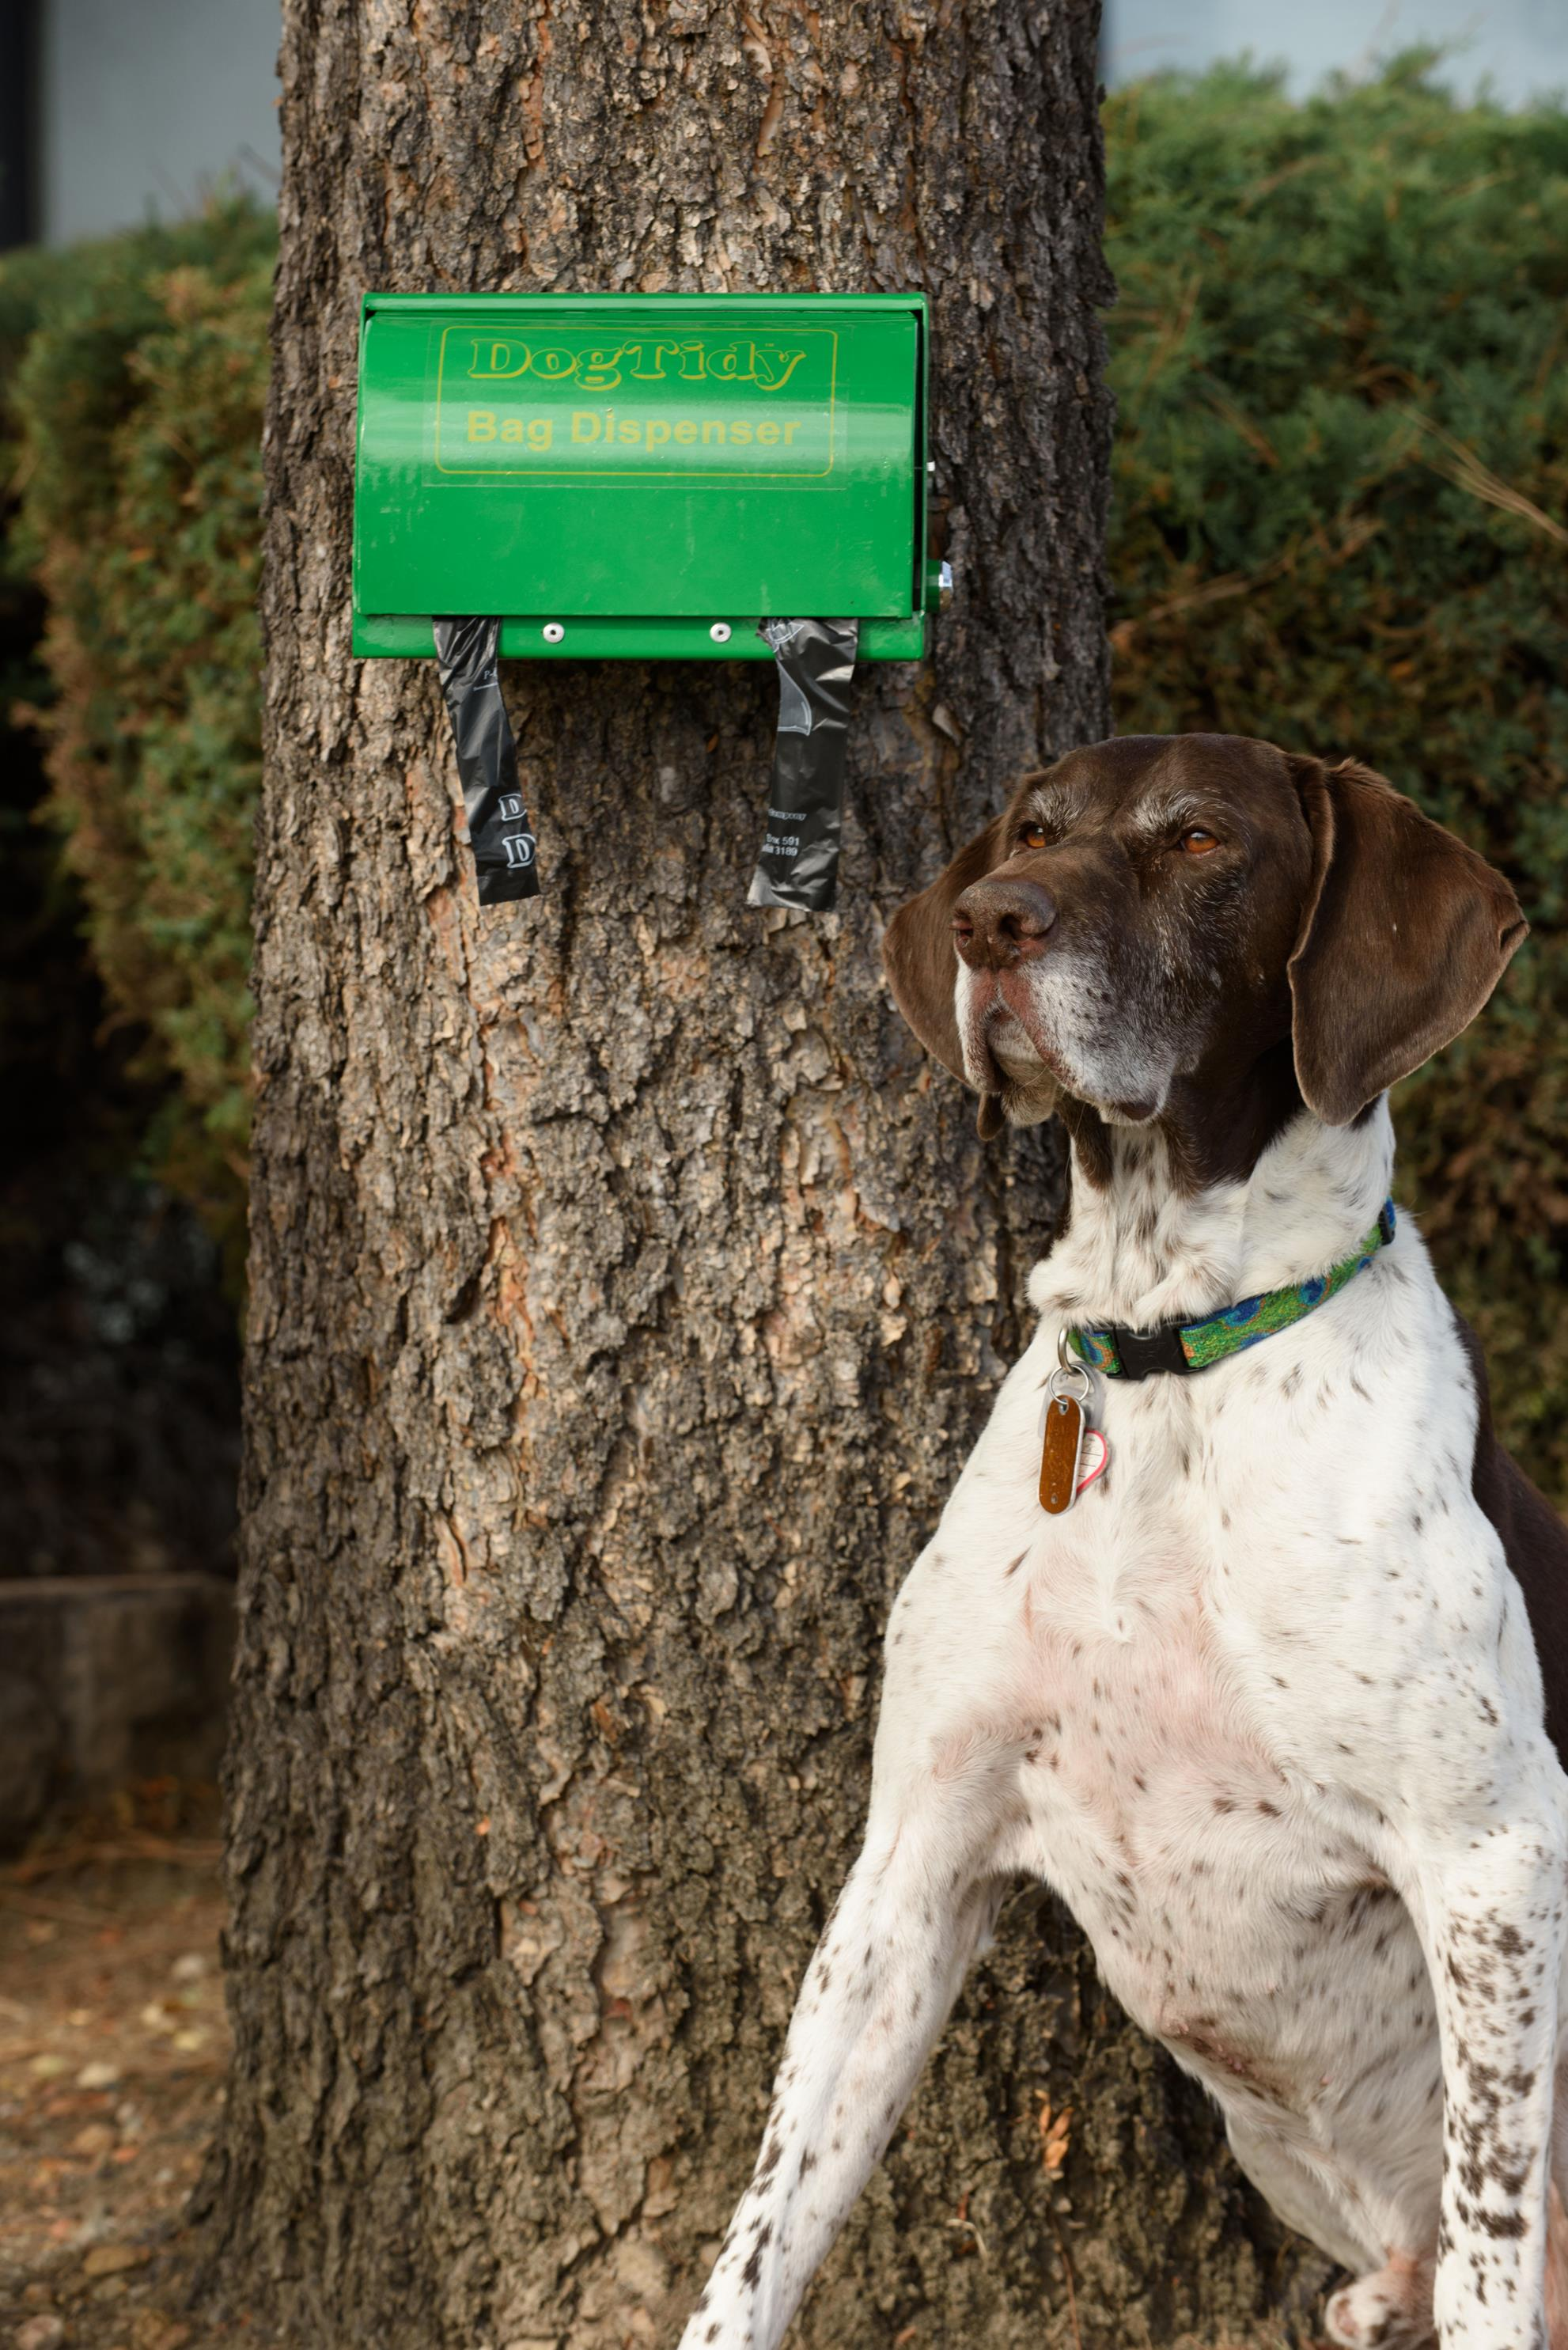 Dog Tidy Bag Dispenser